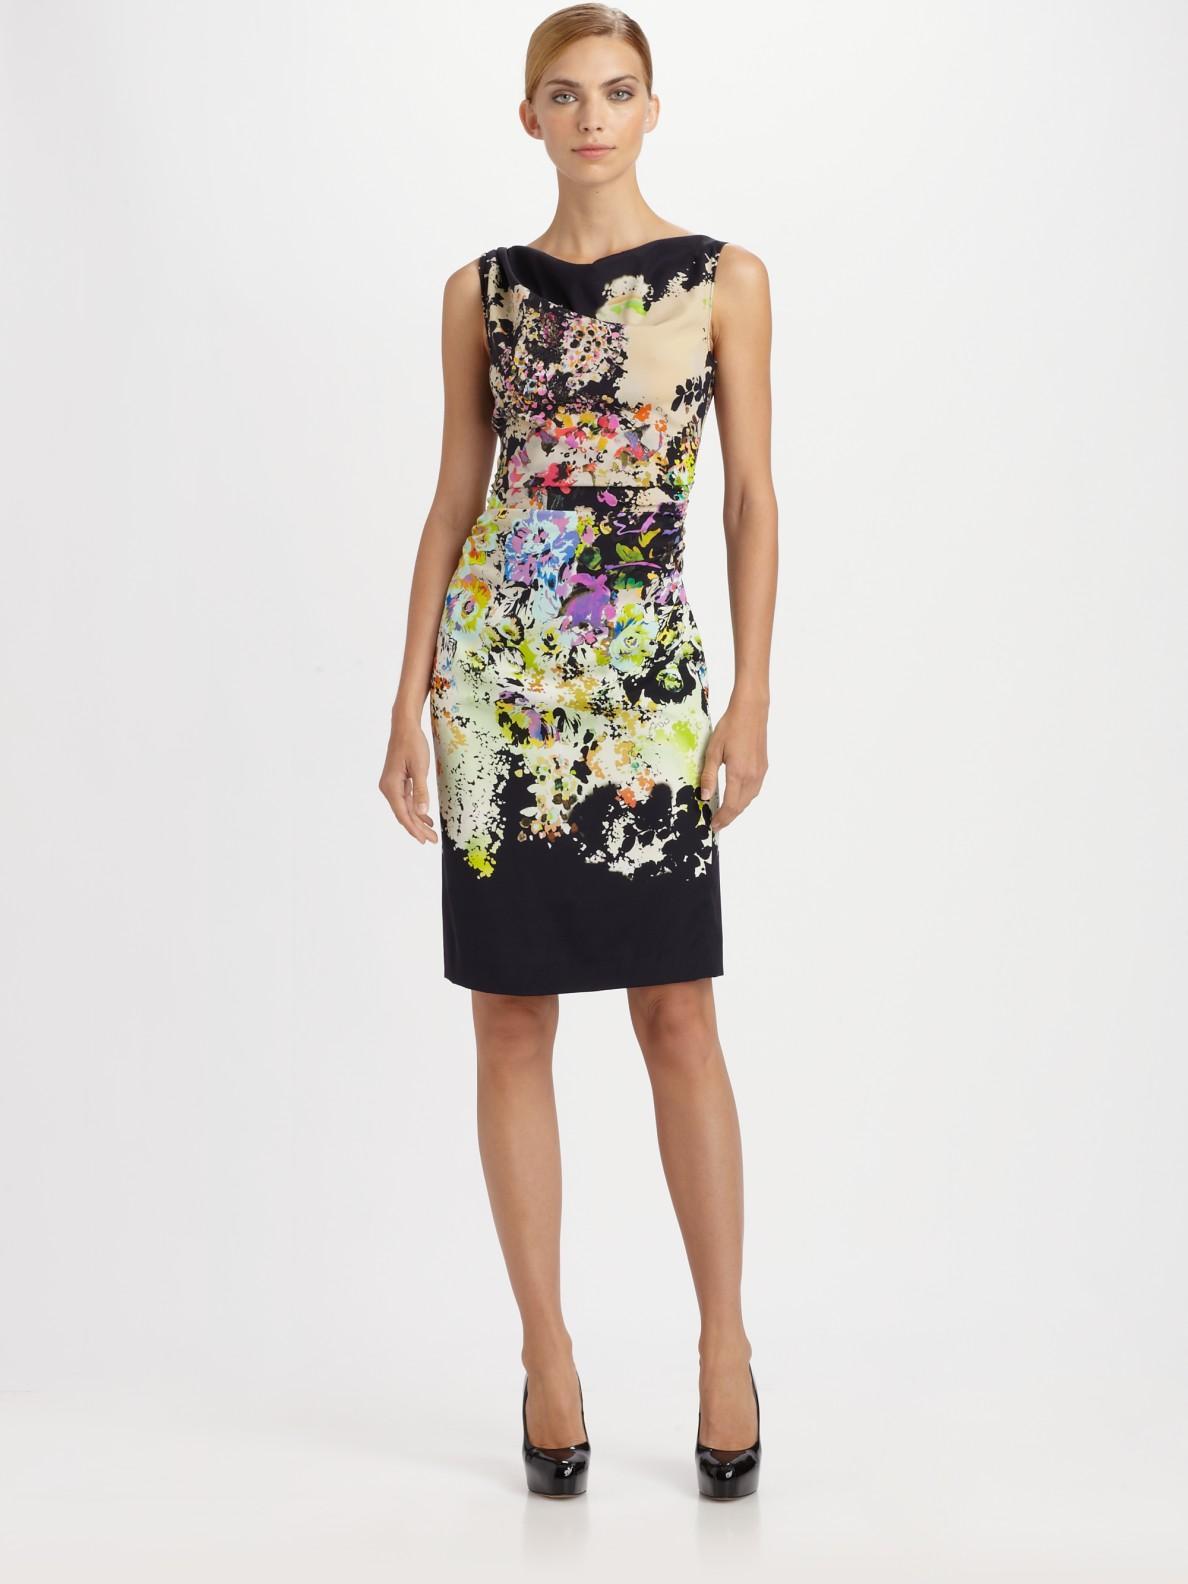 Lyst etro silk floral dress in natural gallery mightylinksfo